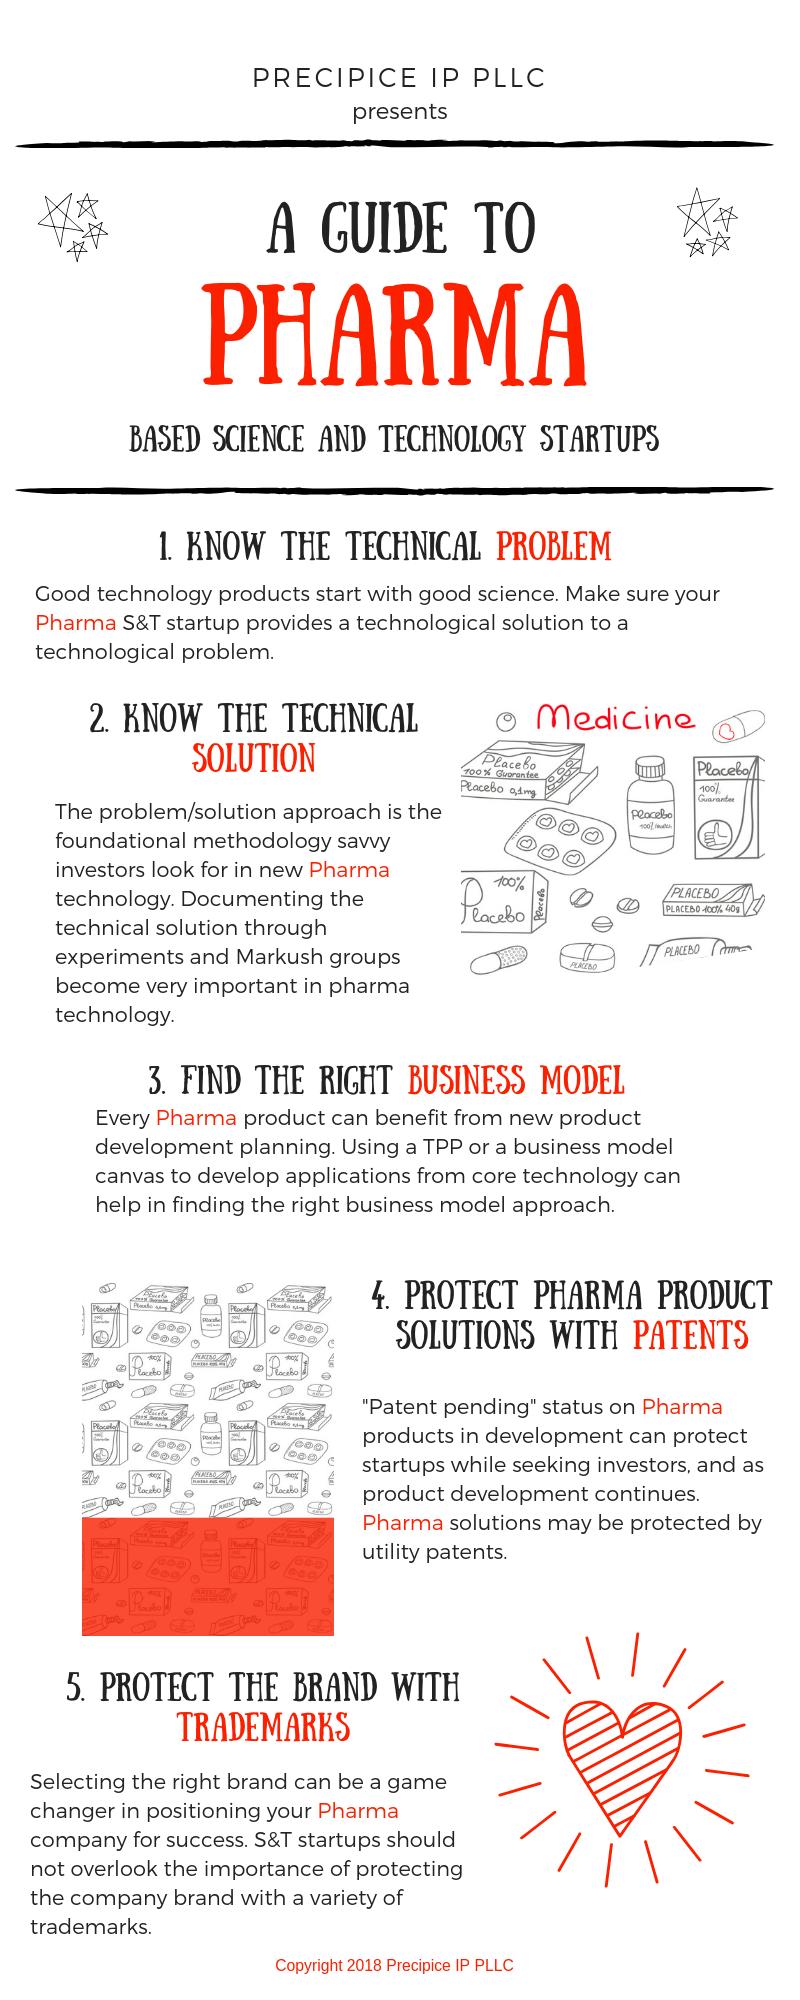 Precipice IP PLLC Infographic-Pharma